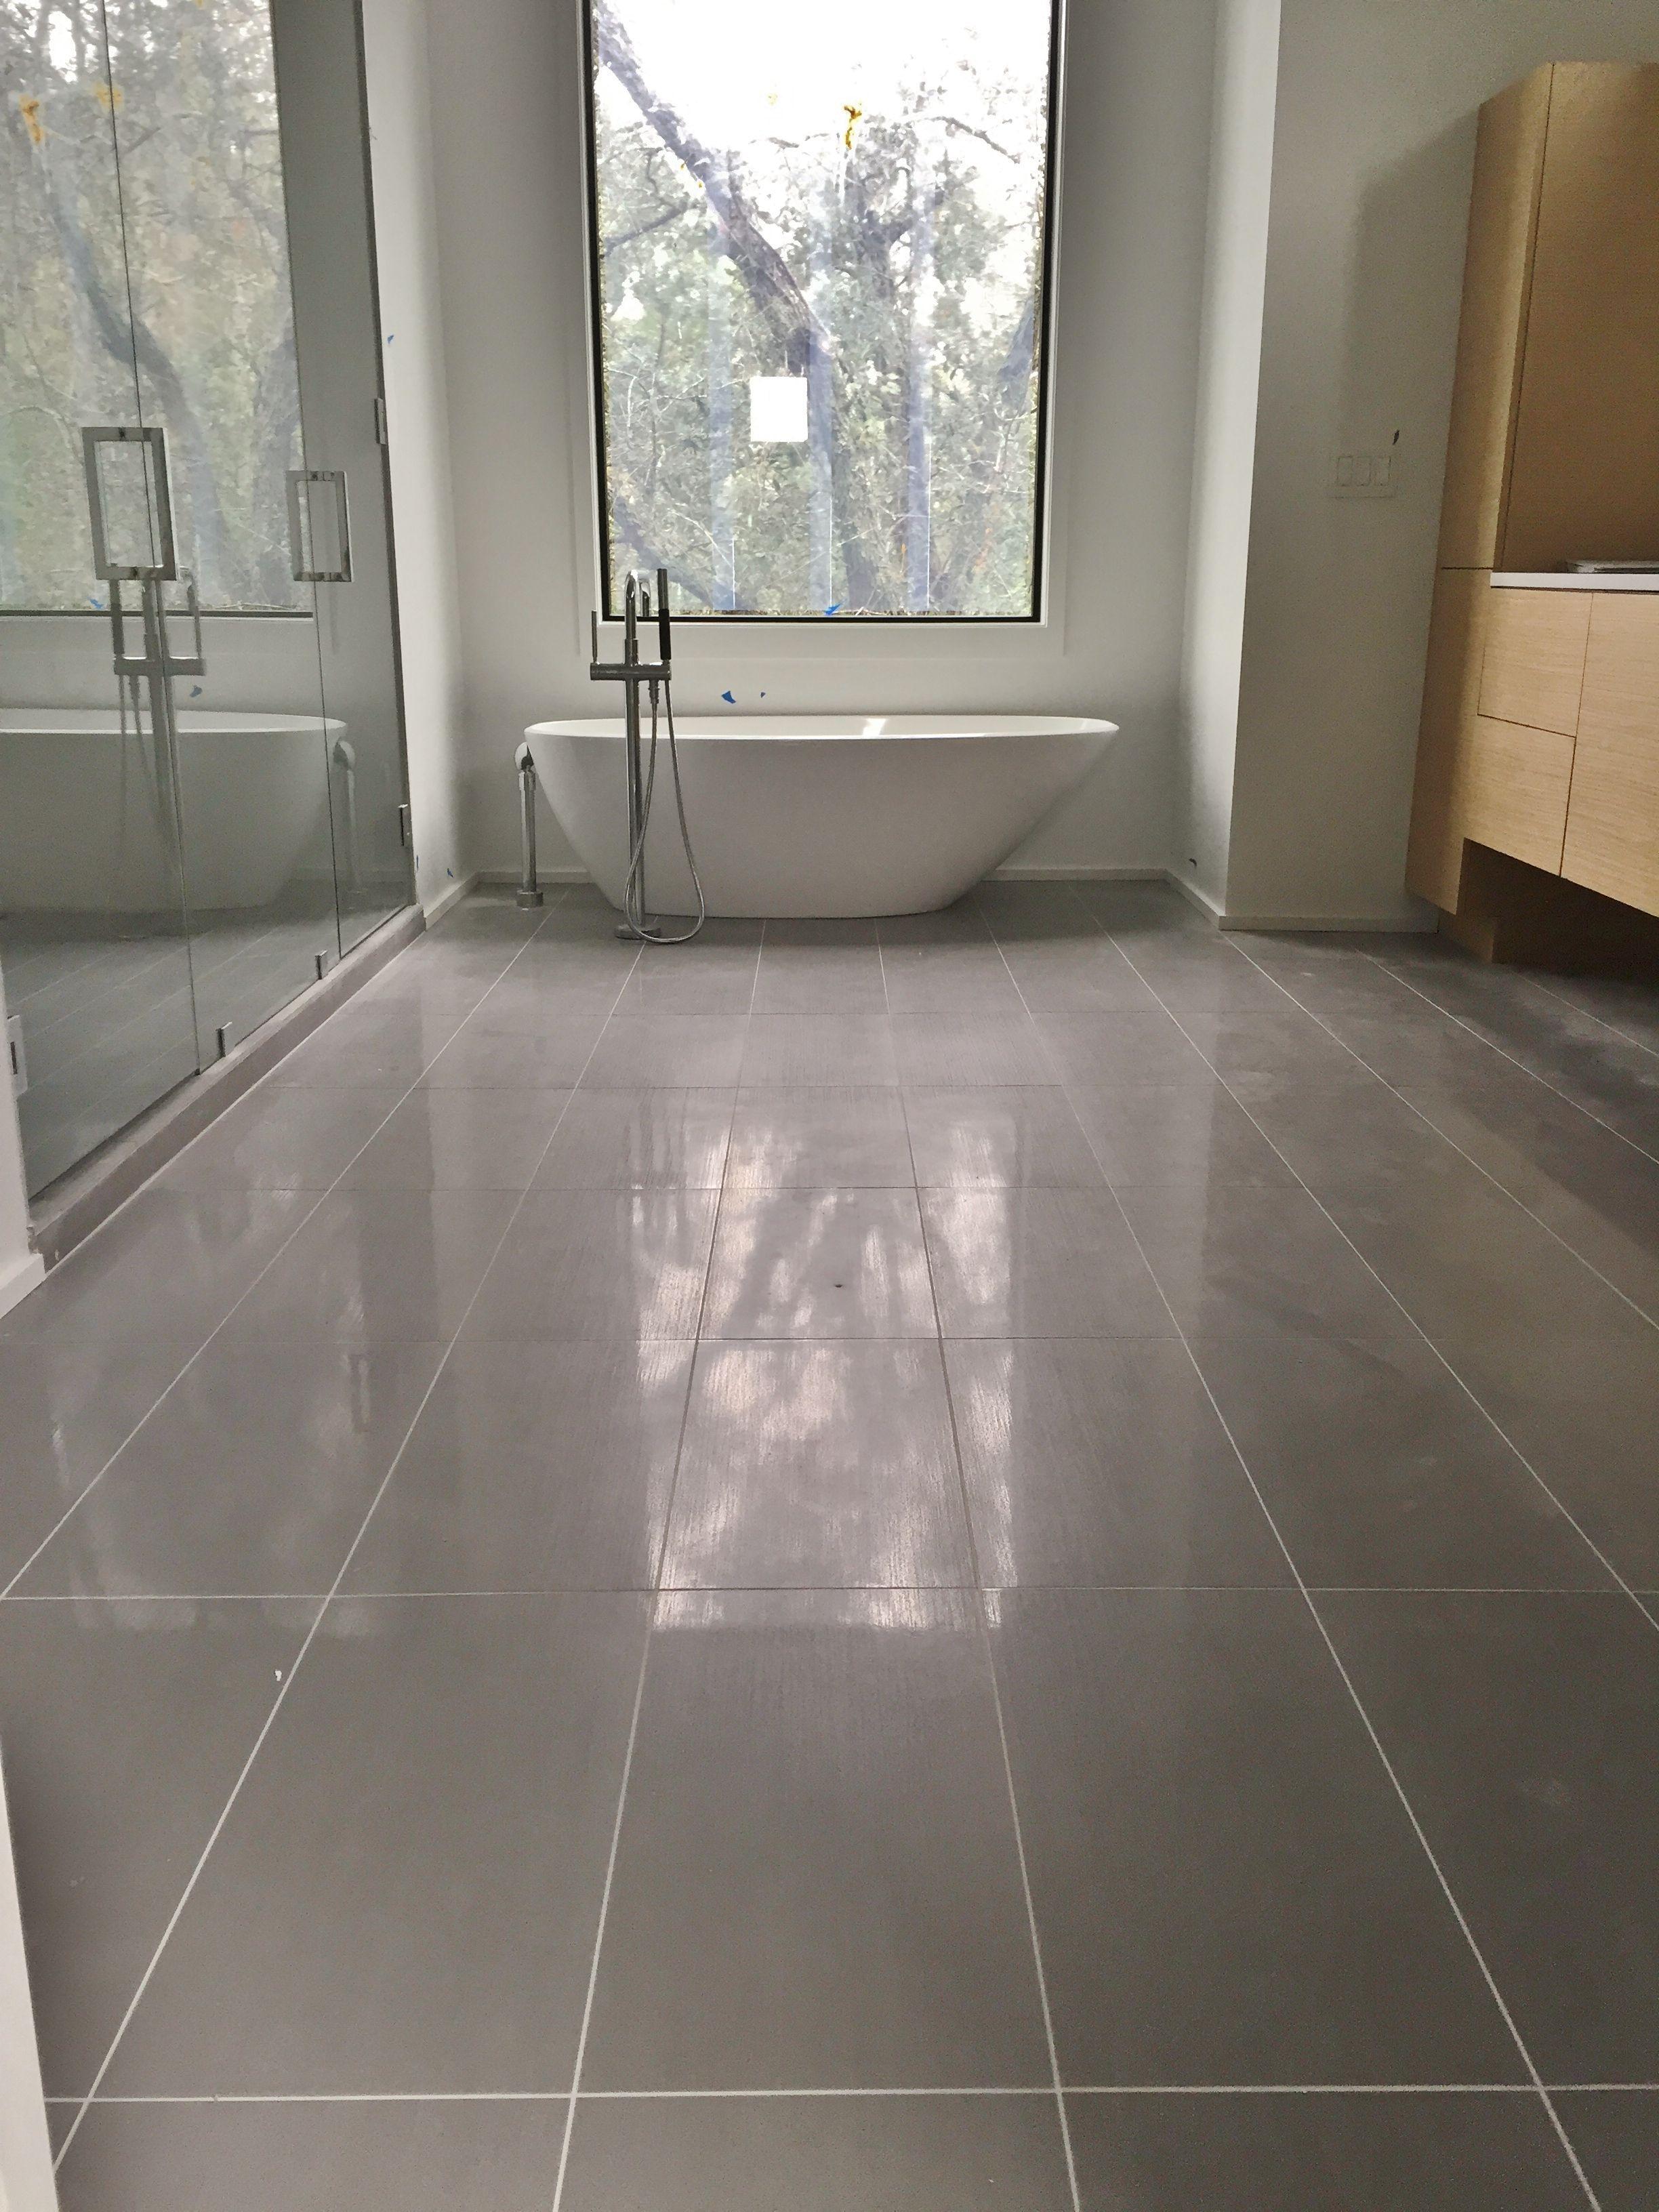 12x24 Porcelain Tile On Master Bathroom Floor Floor Design